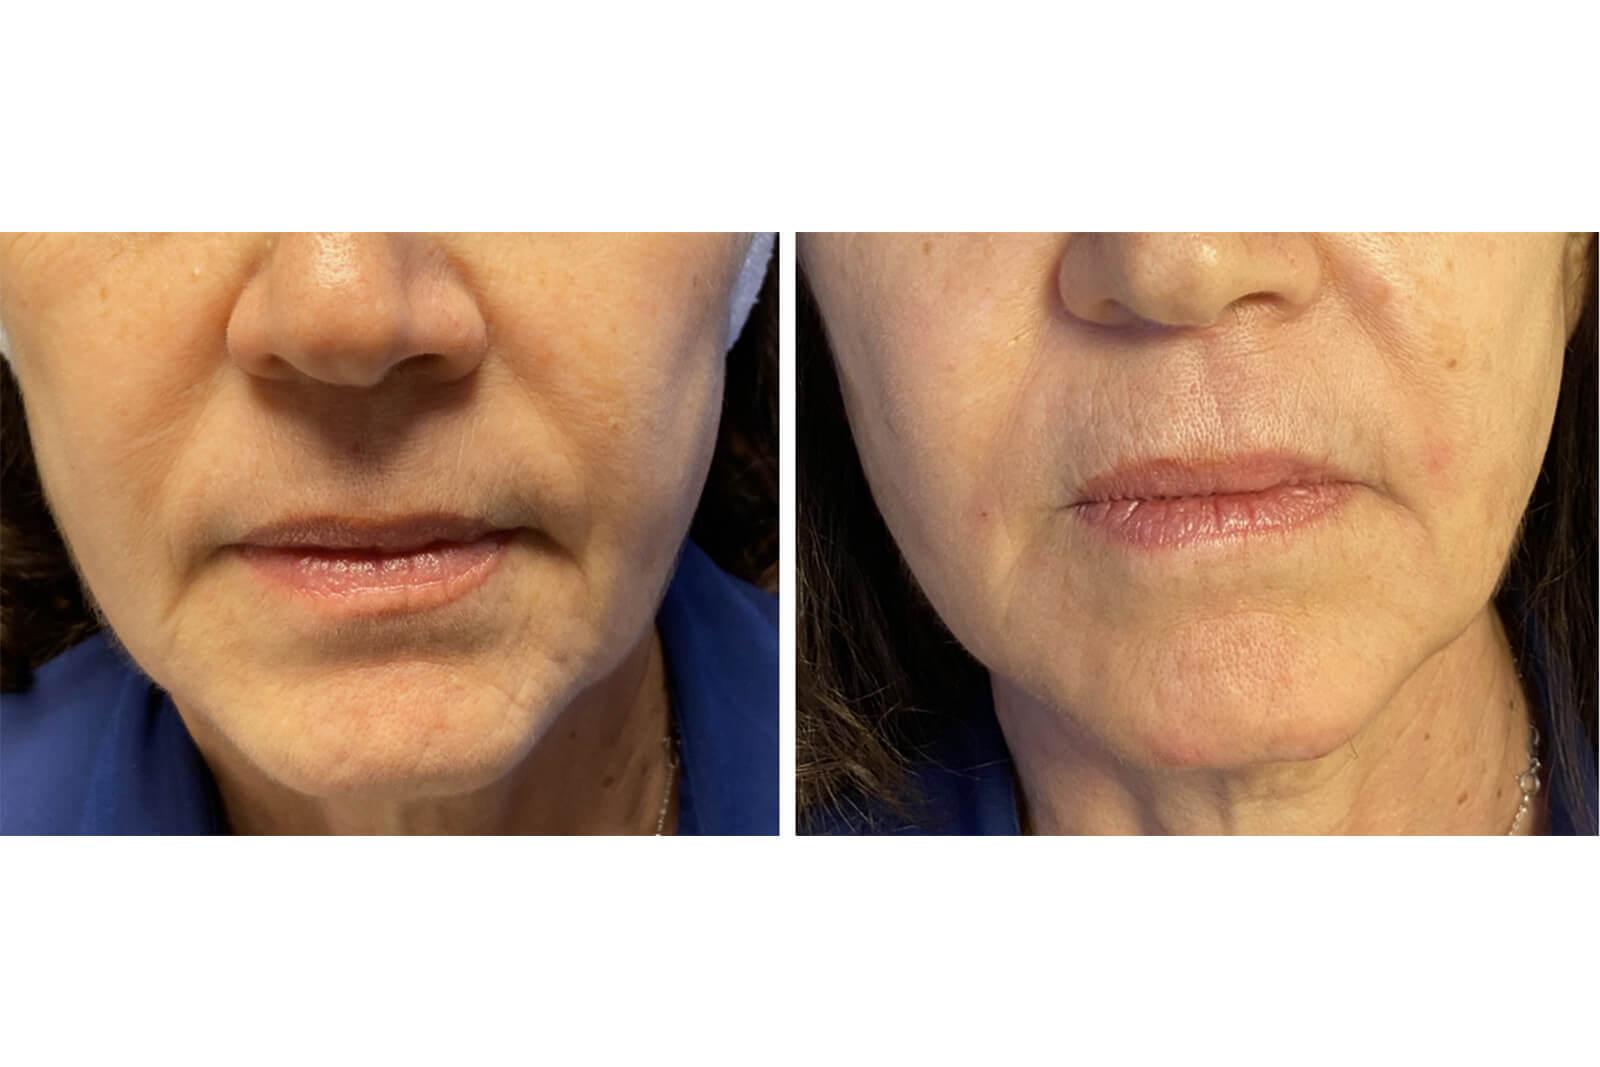 visage - restructuration visage ou profiloplastie 4